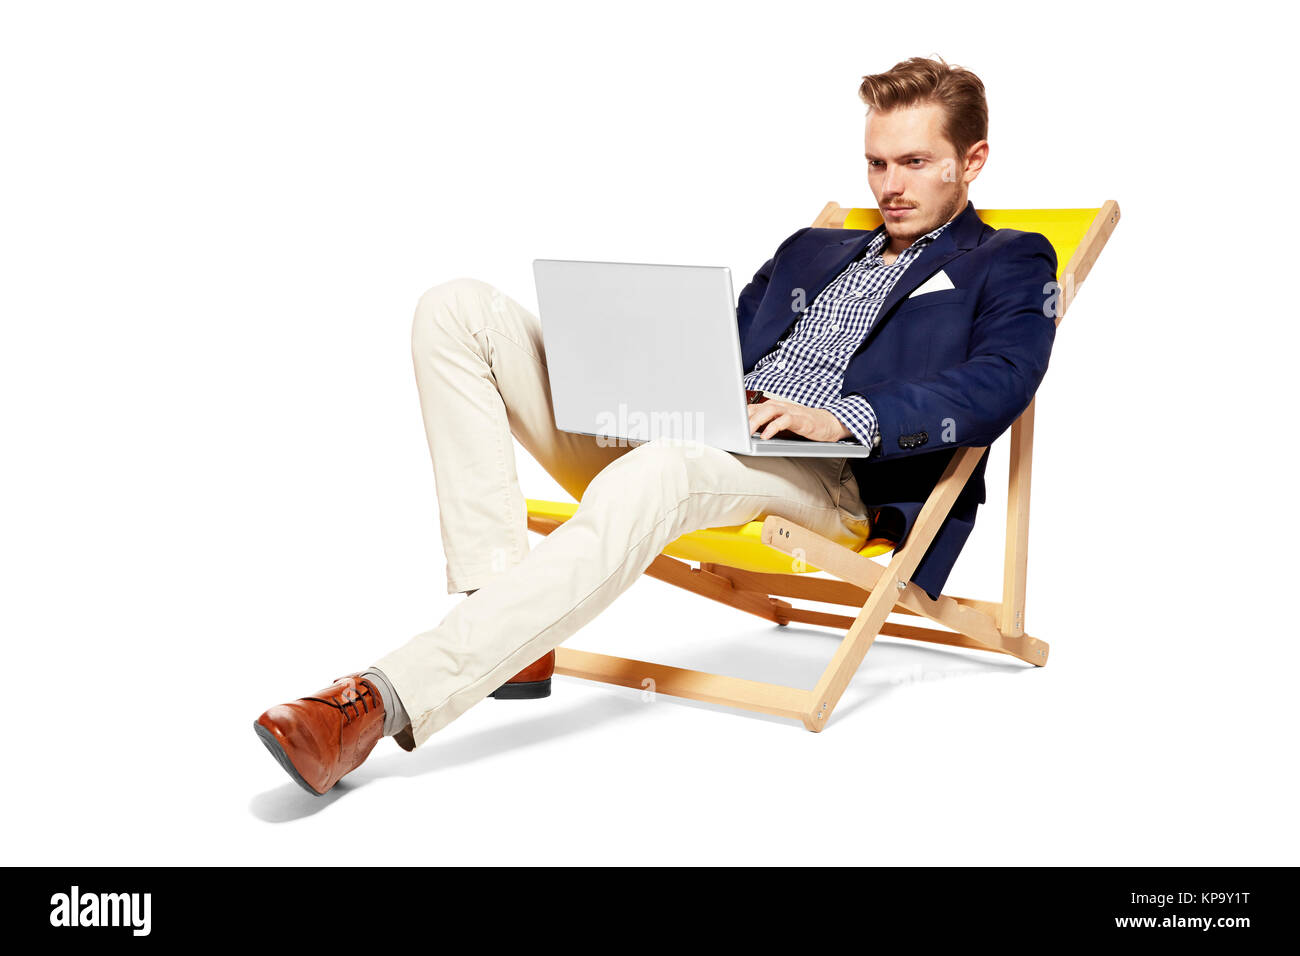 Man Working During Holidays - Stock Image